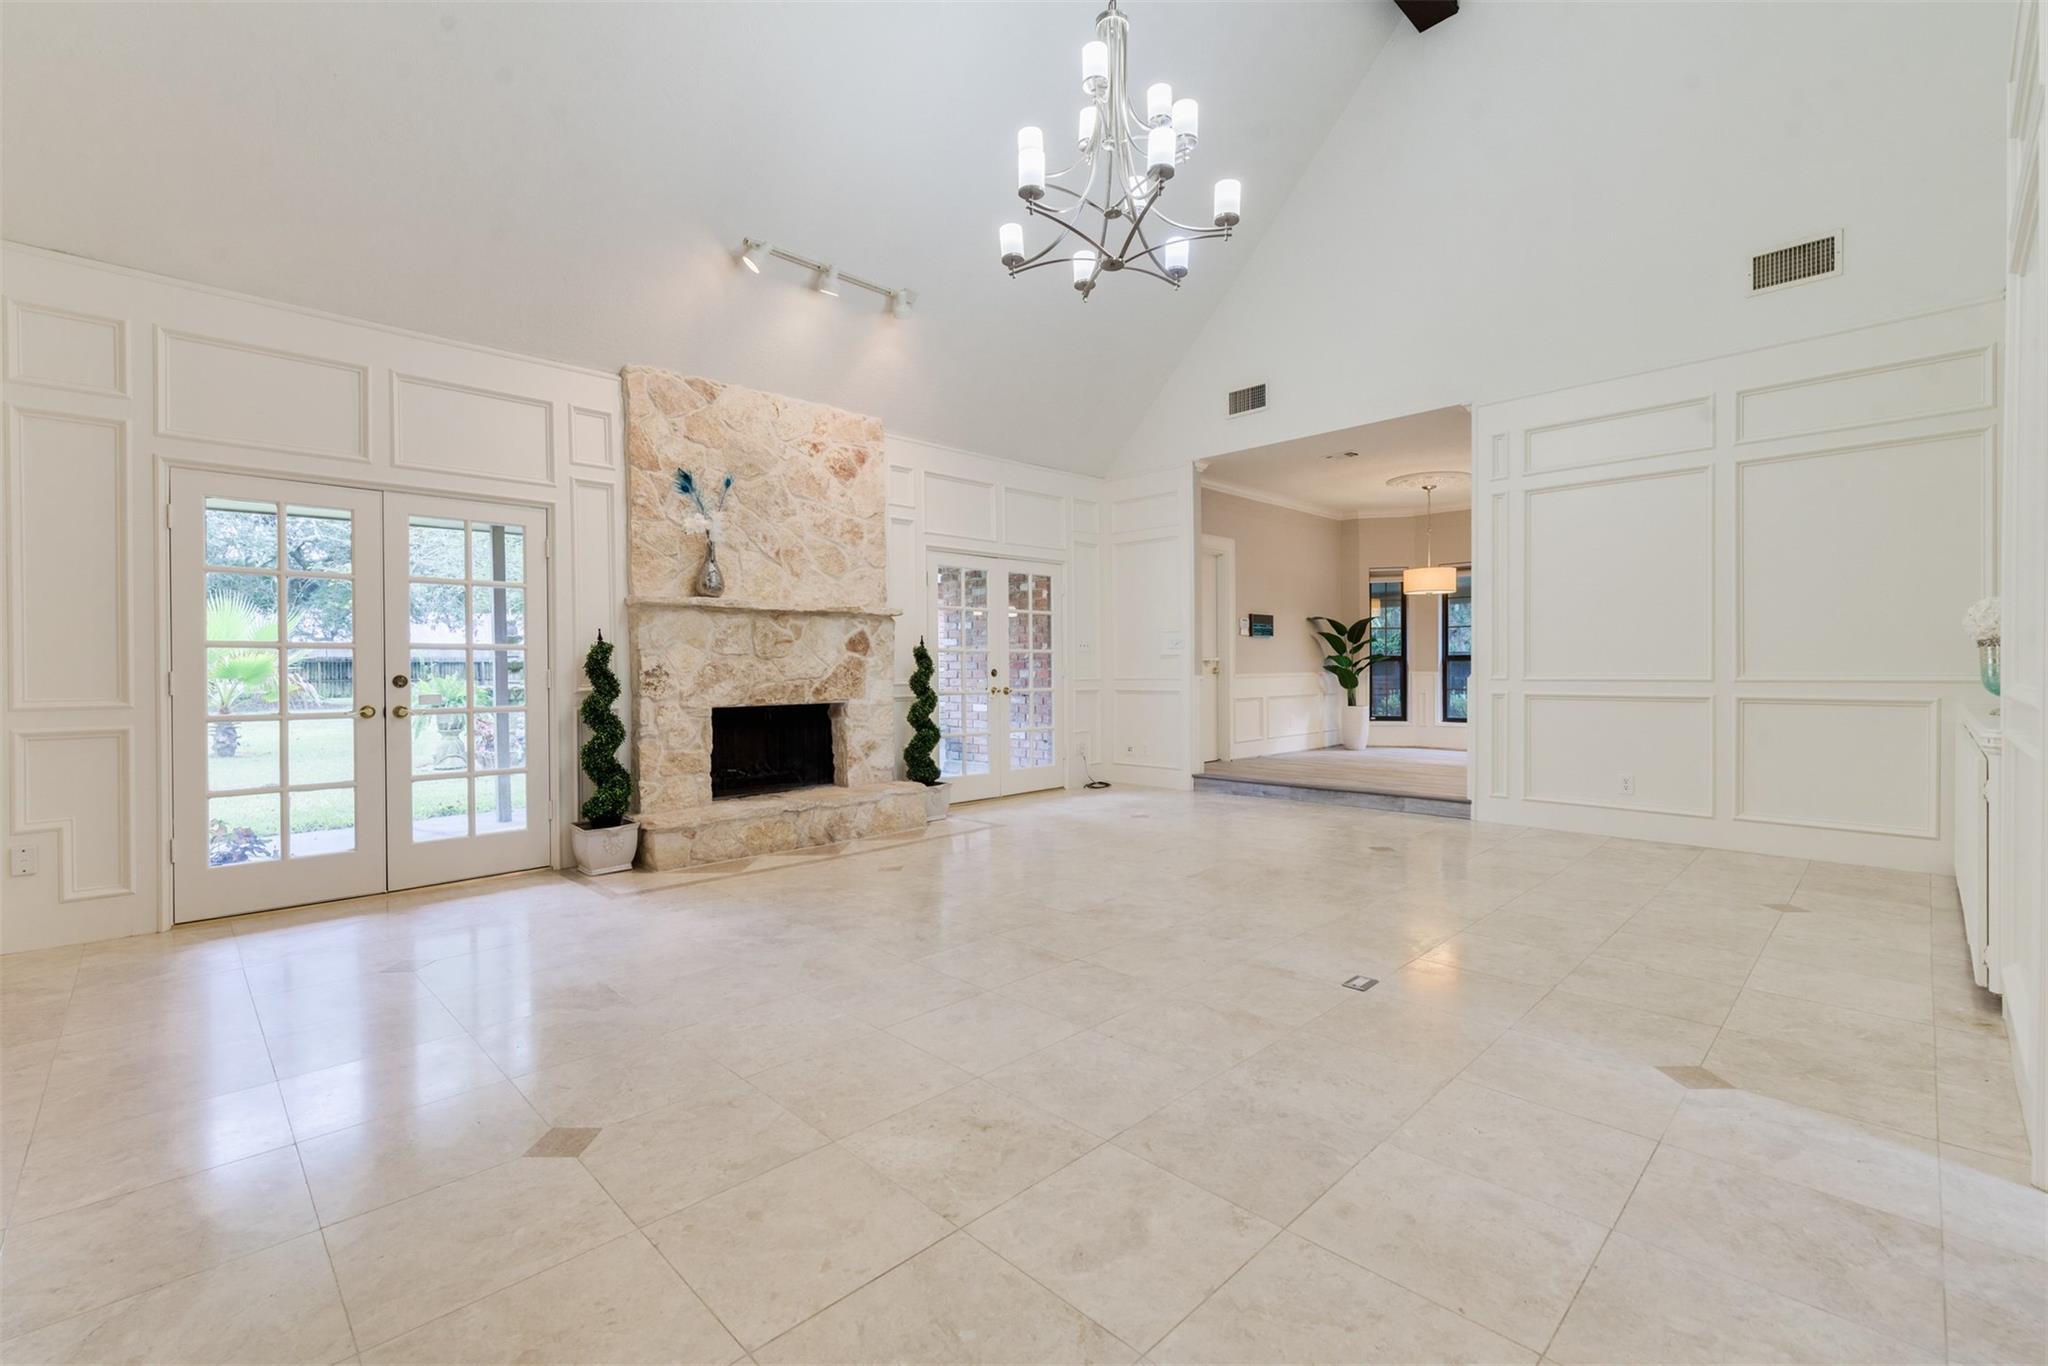 17010 N Ivy Circle Property Photo - Houston, TX real estate listing